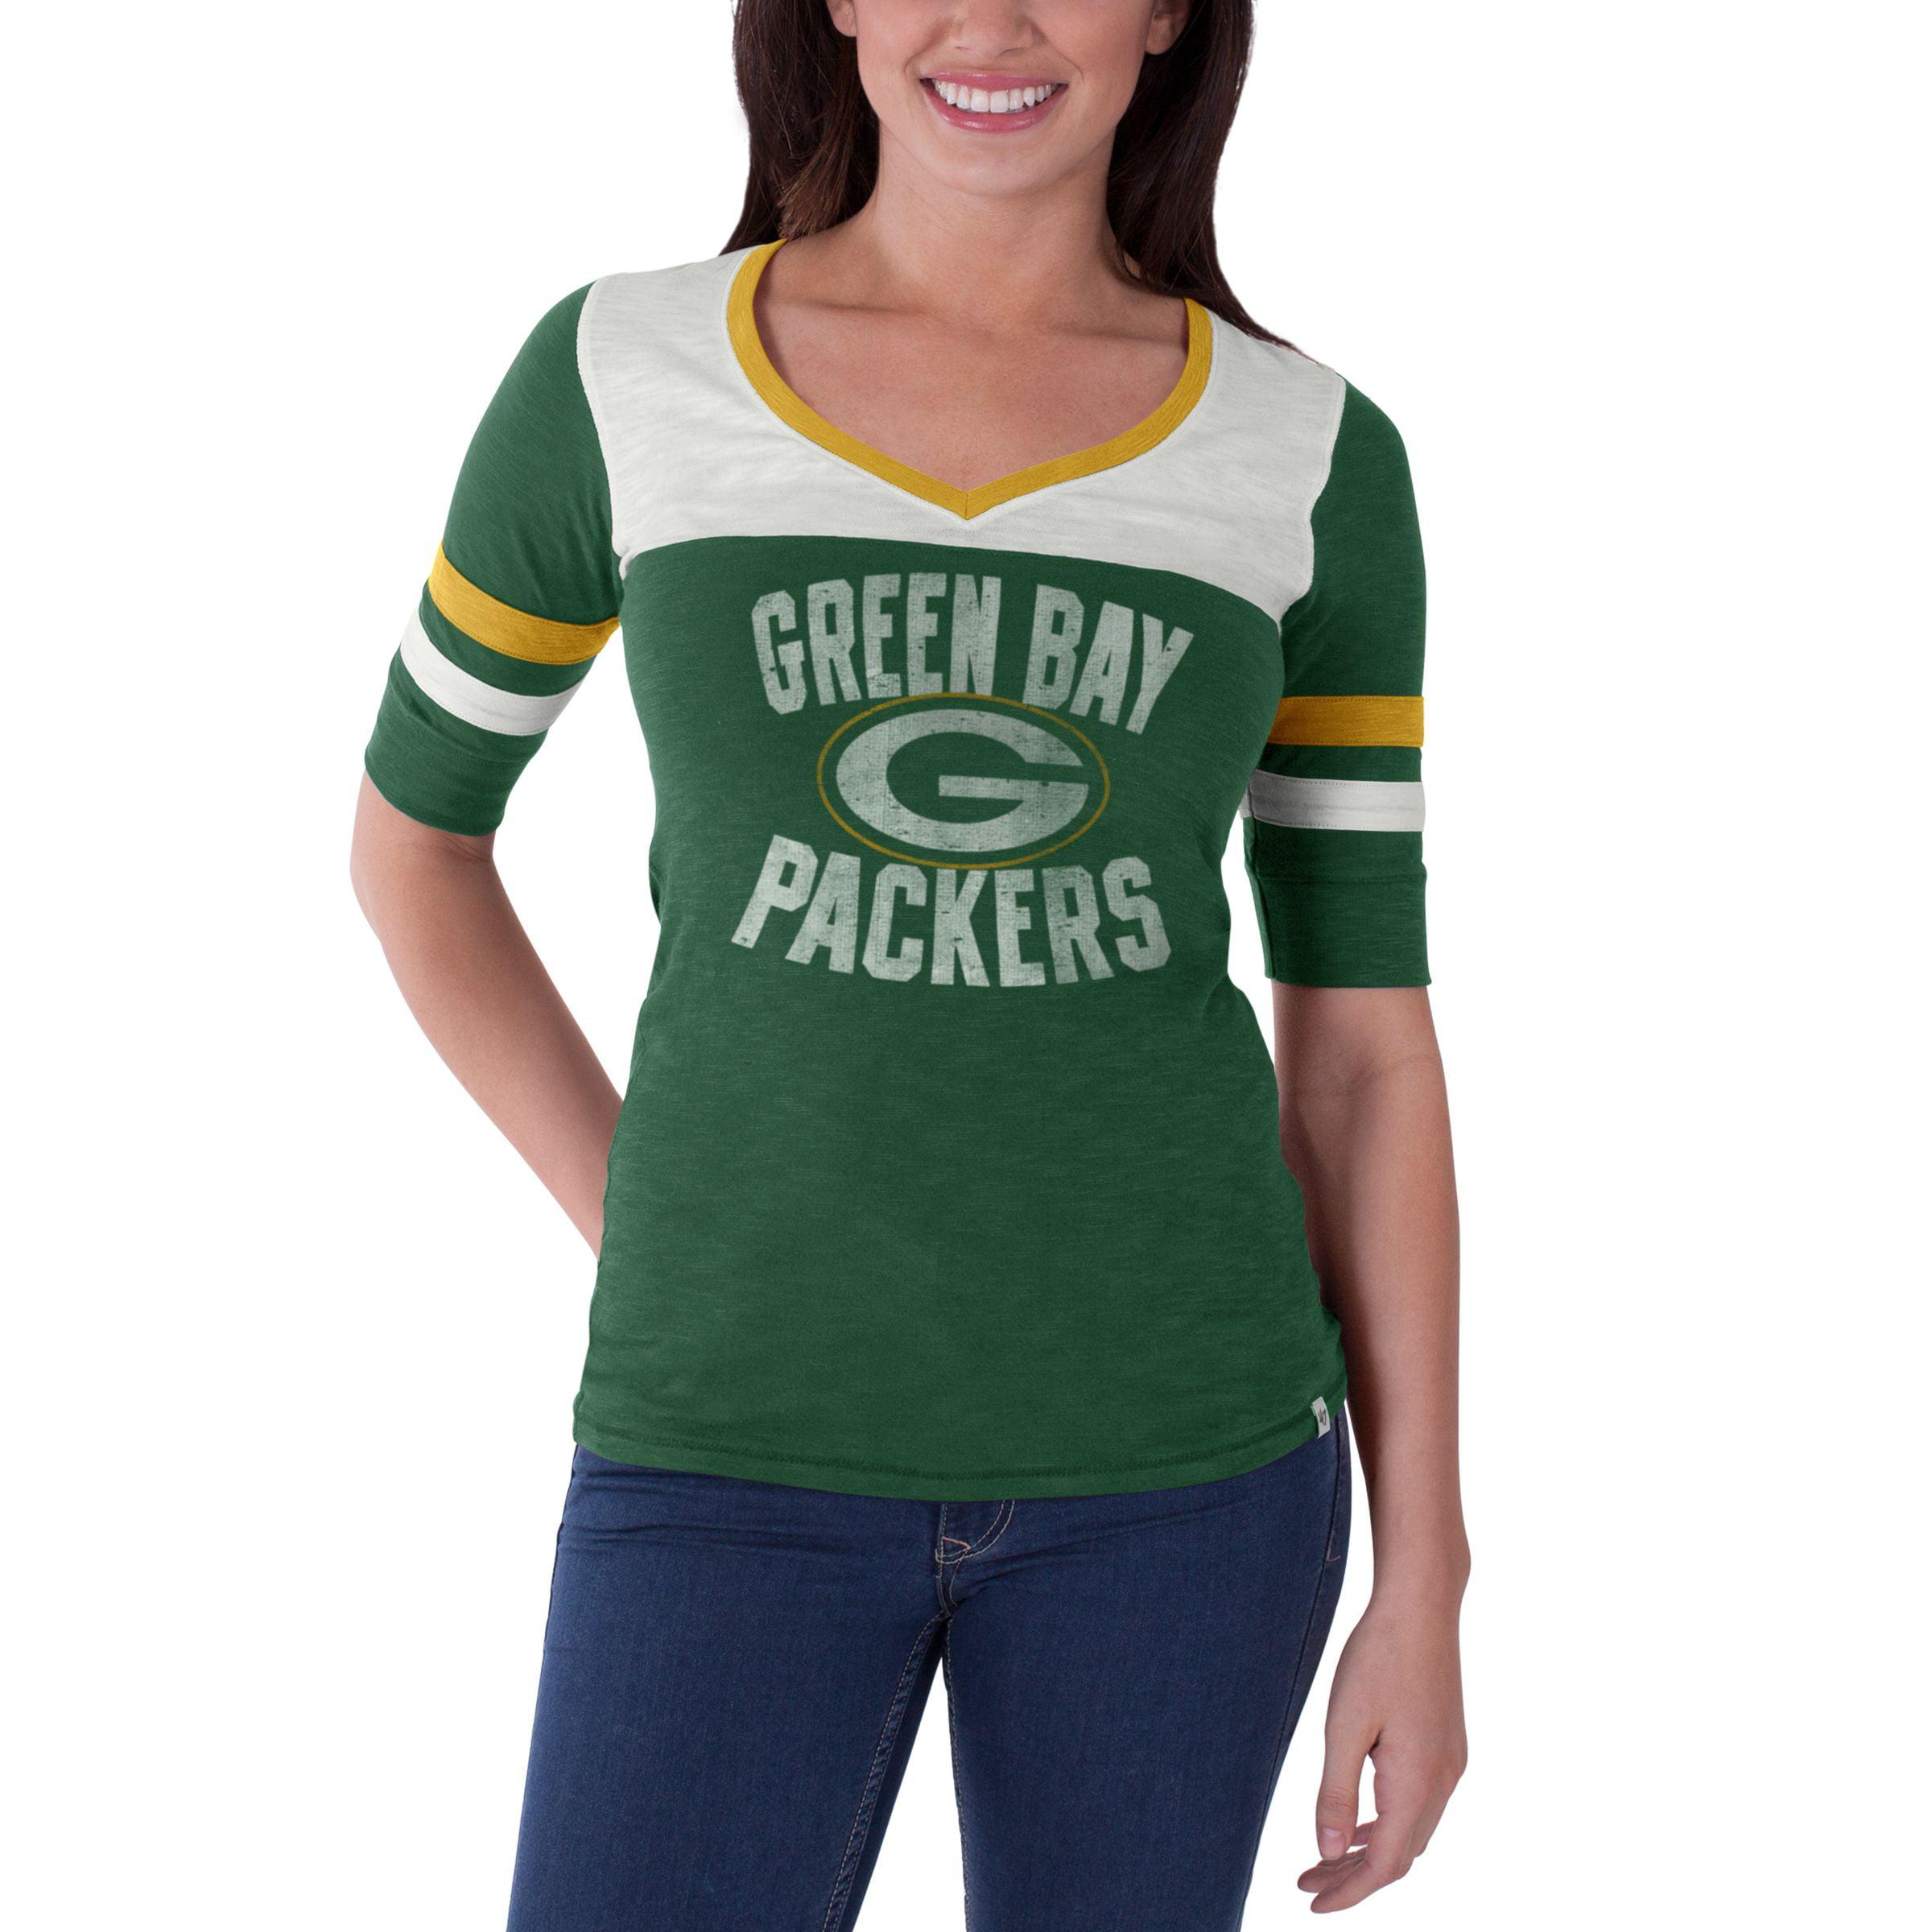 Green Bay Packers Pine Gameday Debut Women's Shirt